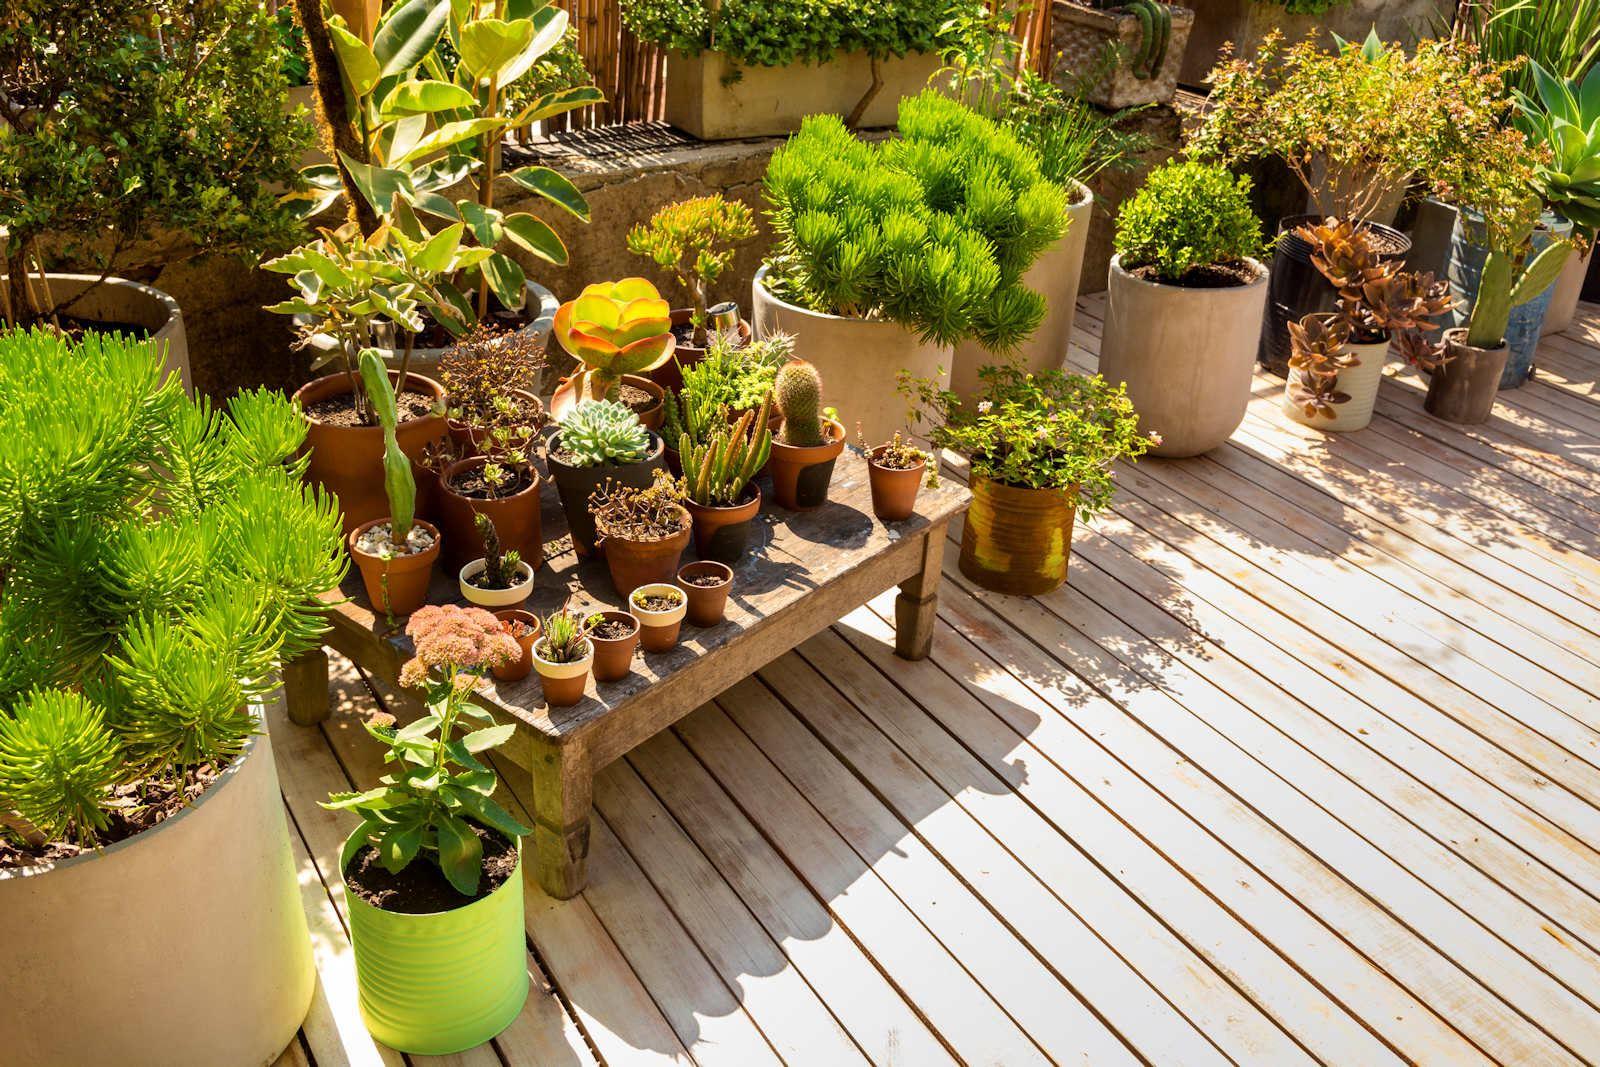 The Terrace Gardener of Dalkeith